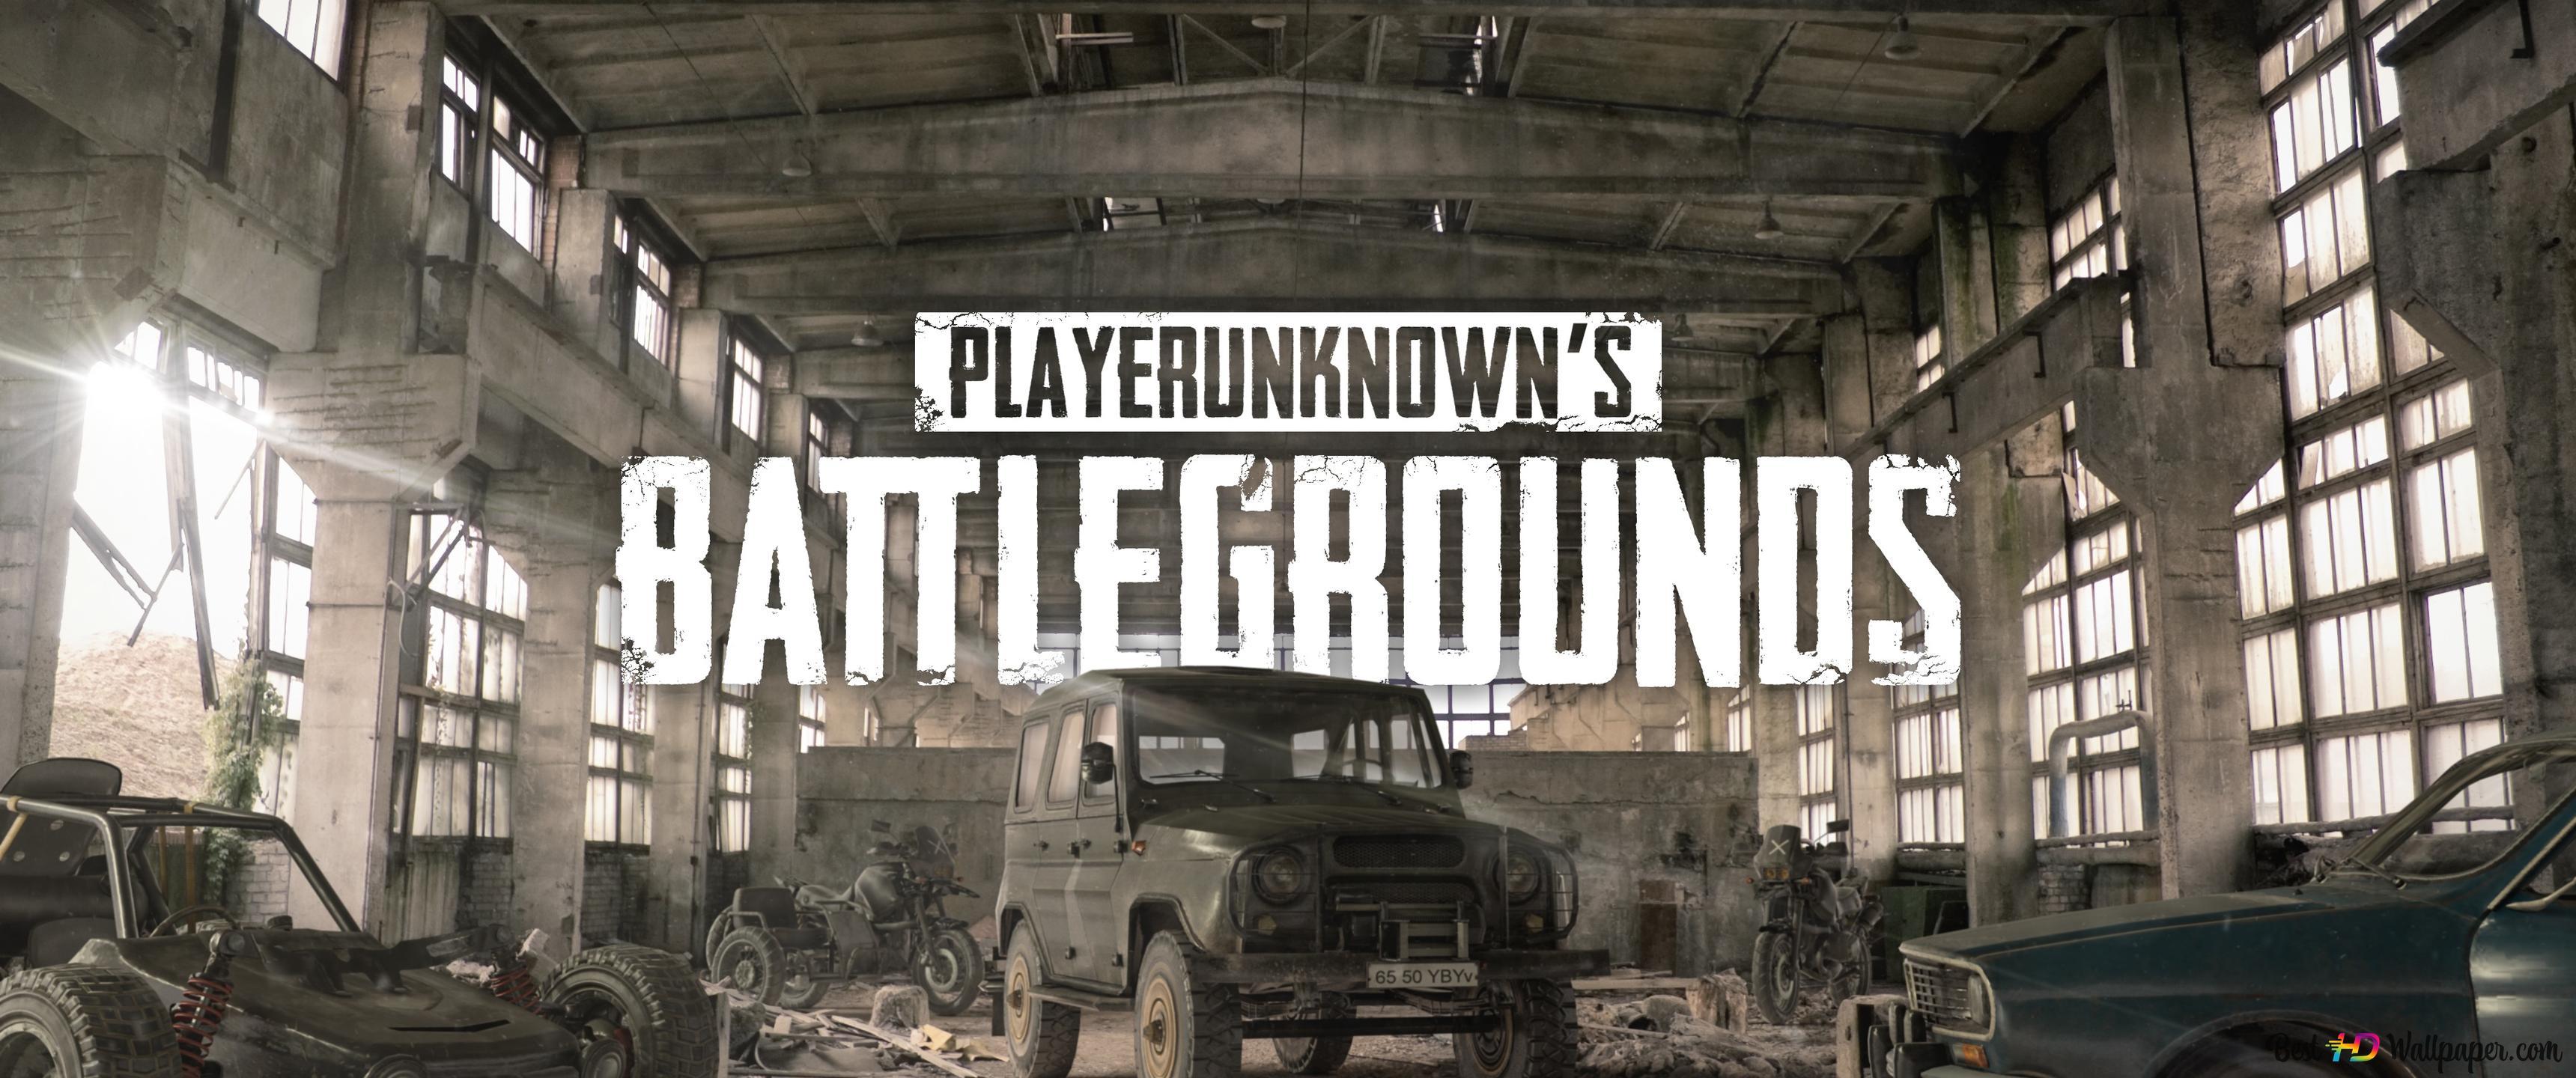 Pubg Playerunknown S Battlegrounds Hd Wallpaper Download